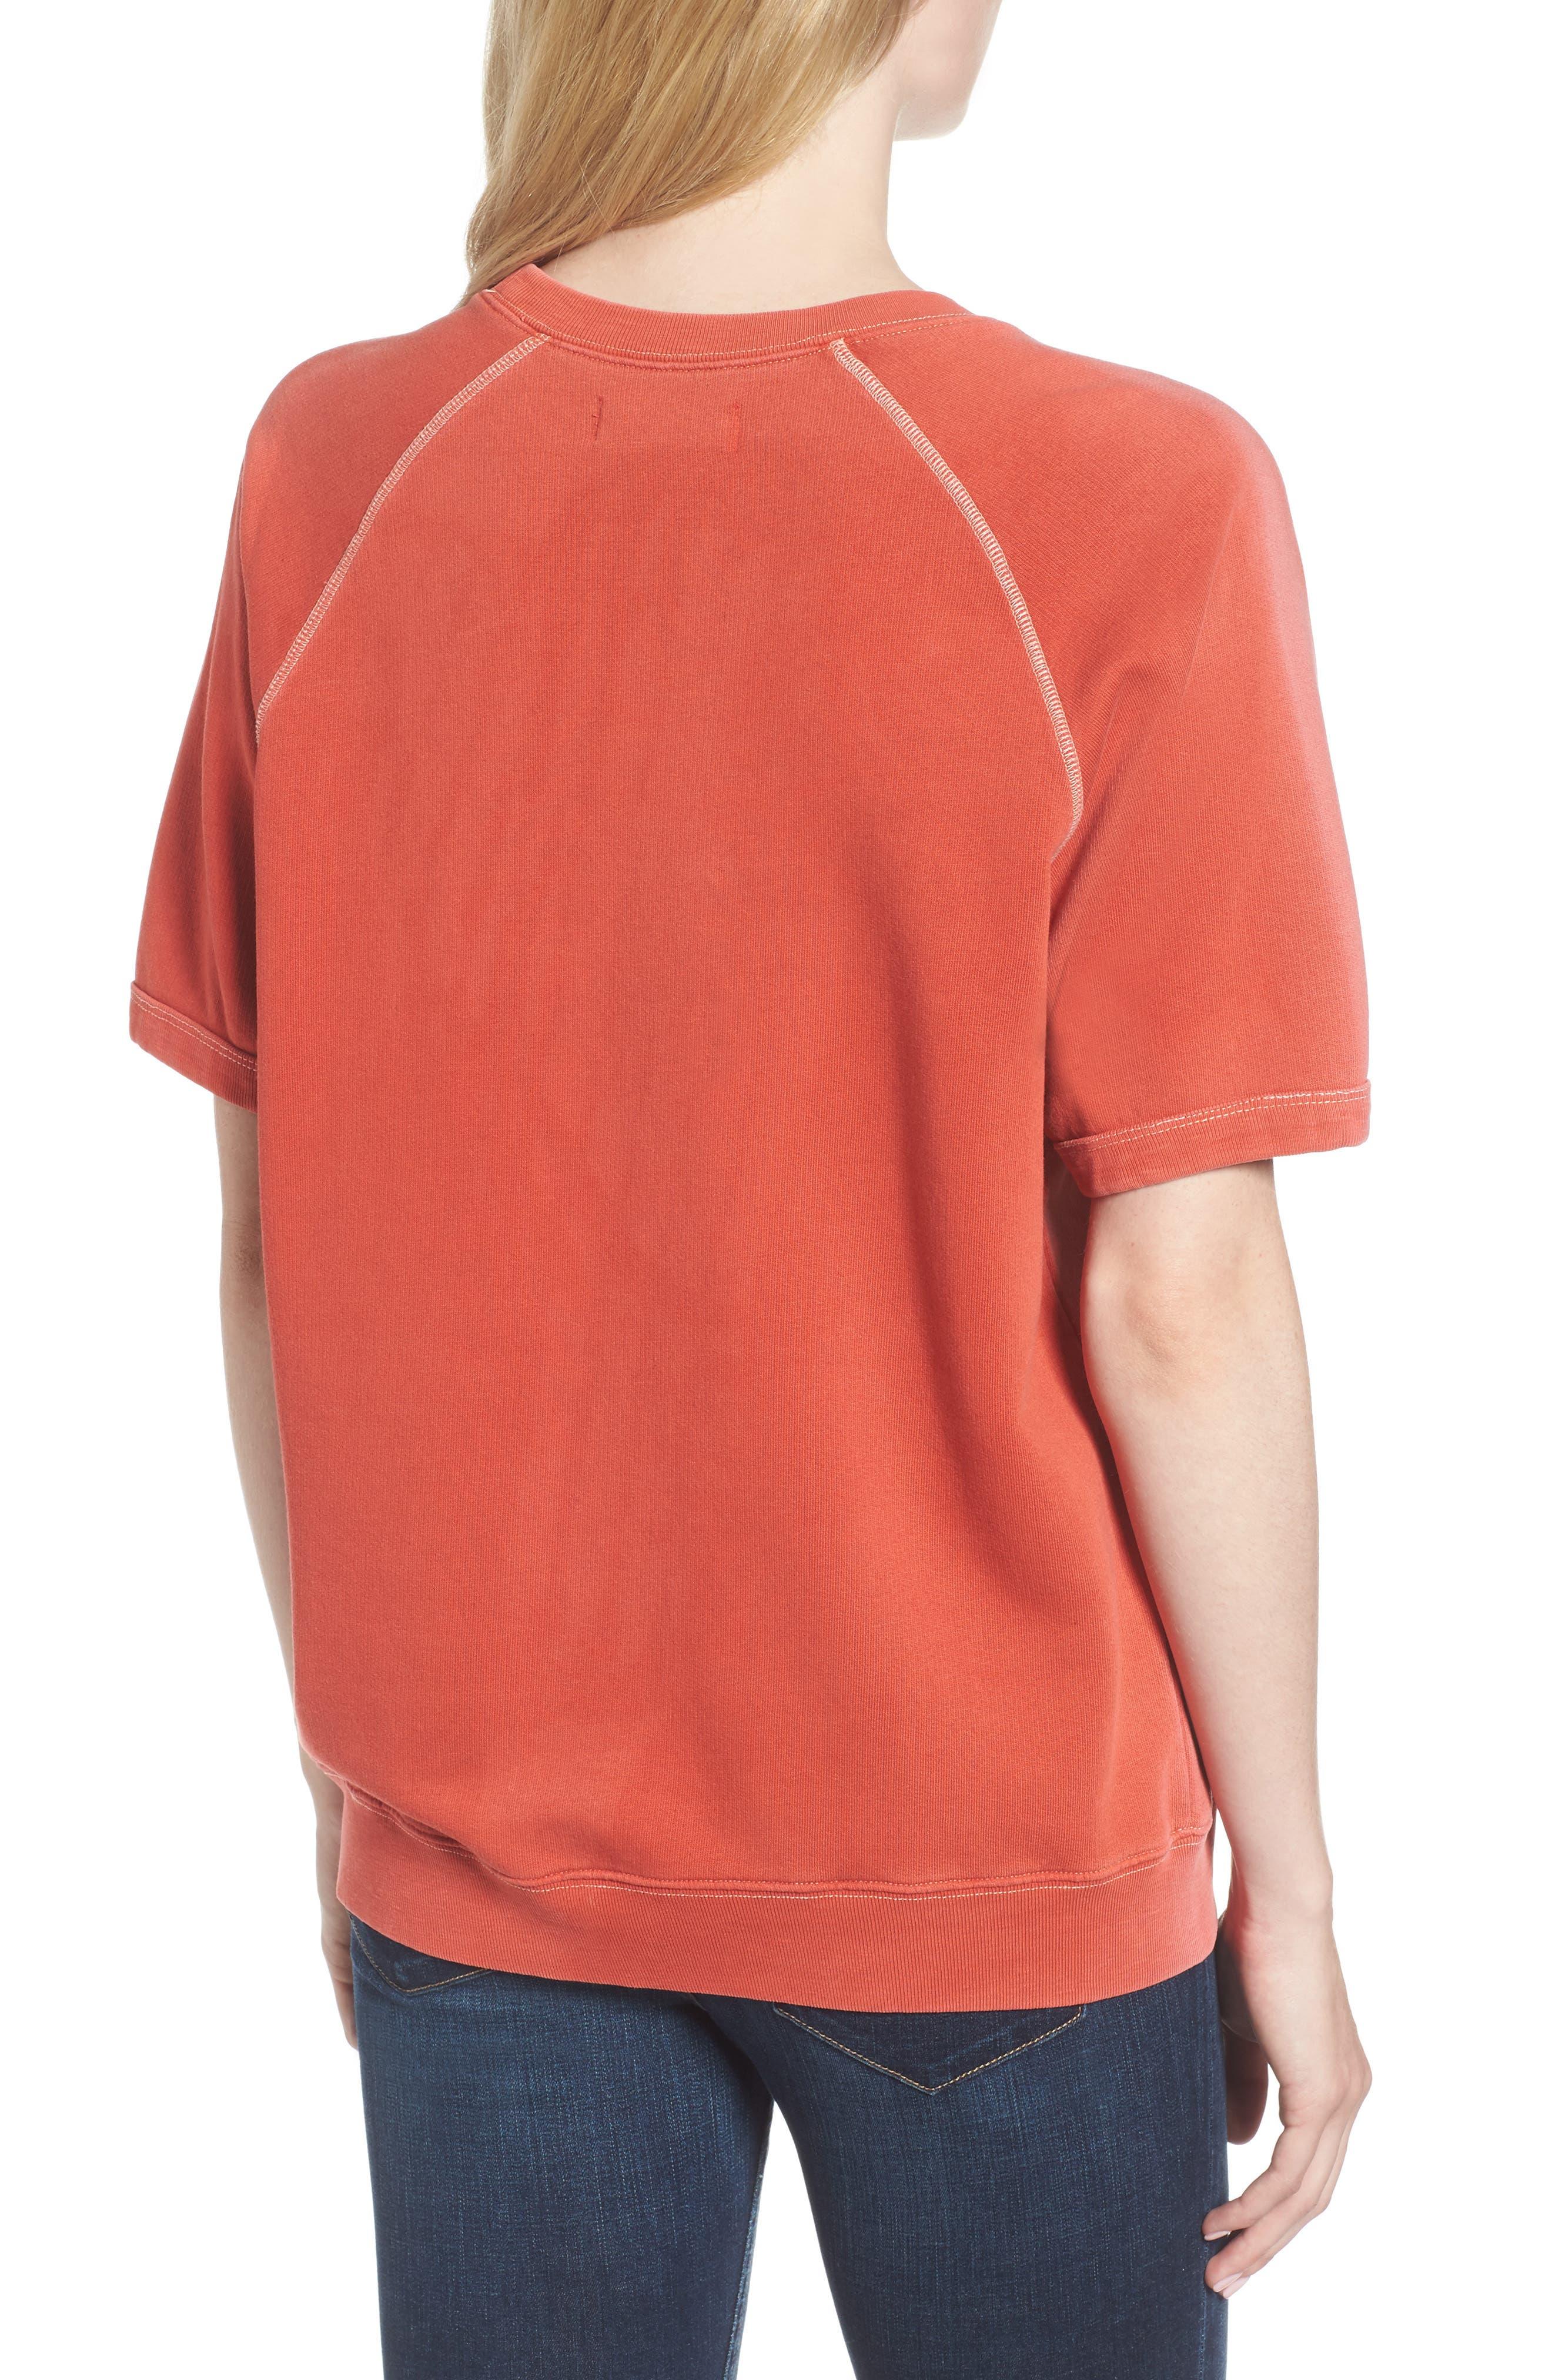 Alternate Image 2  - Sincerely Jules West Coast Sweatshirt